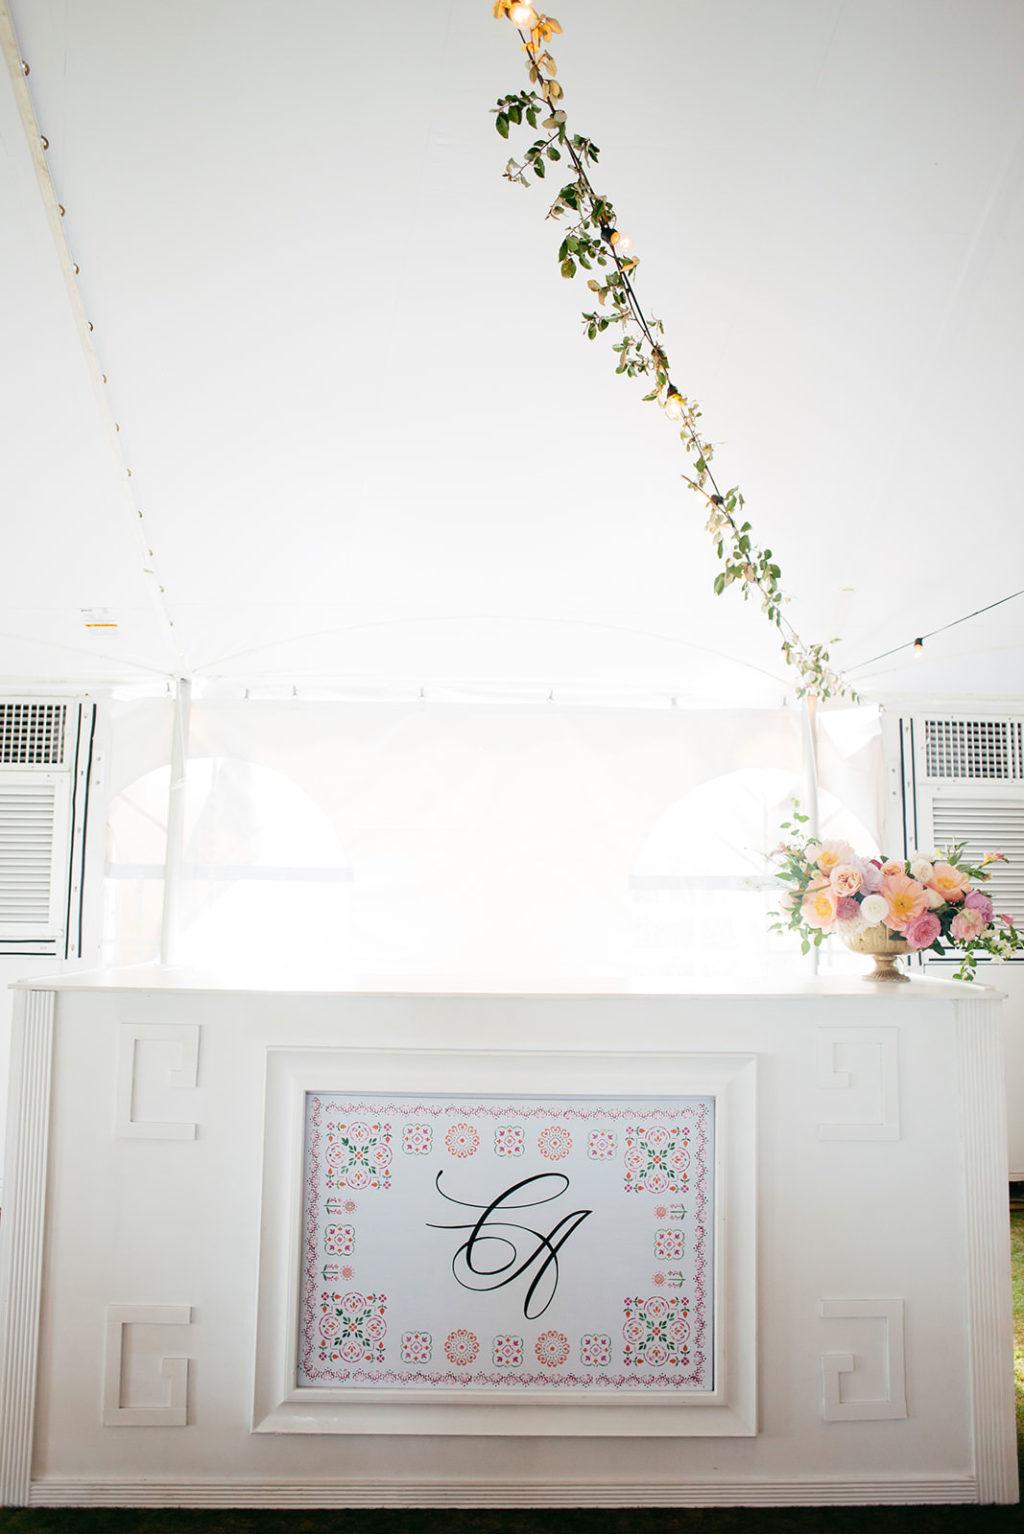 Elegant Tropical Wedding Reception Decor, Hanging Floral Draping, Monogram Photo   Tampa Bay Wedding Planner NK Weddings